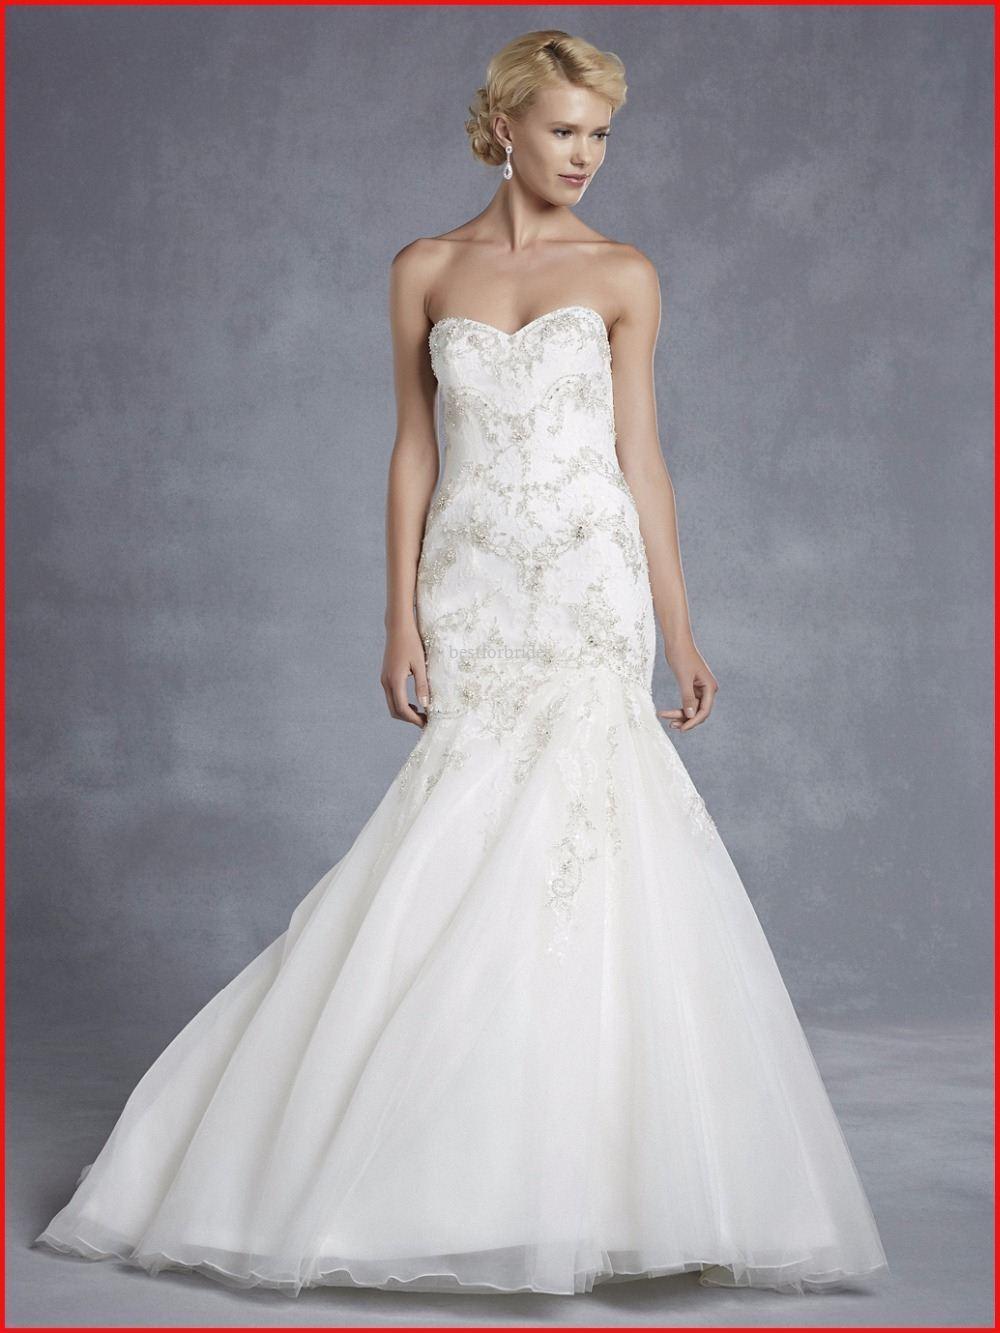 Mermaid bridal gowns wedding dresses 2015 houston wedding dresses